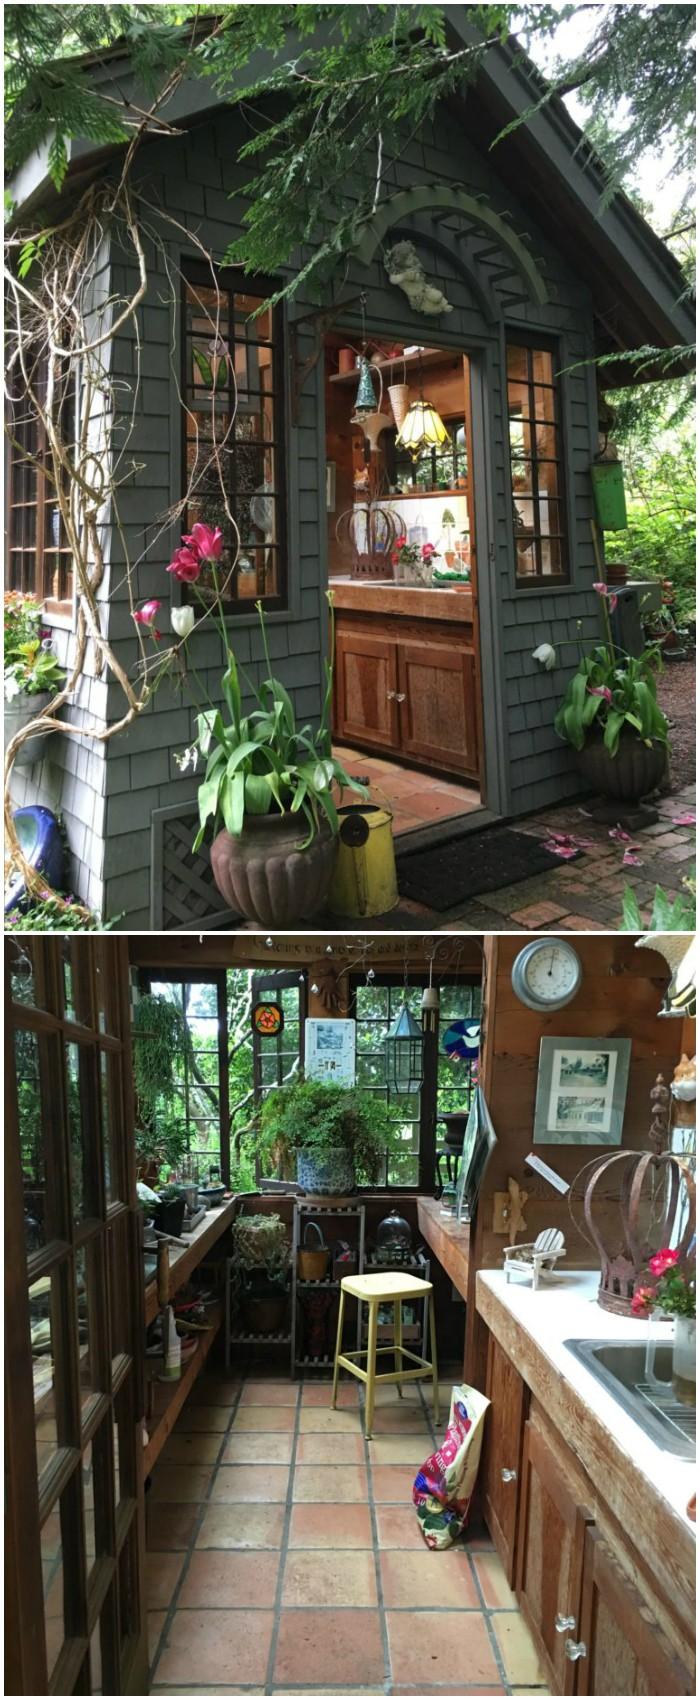 30 Cheap And Easy DIY Shed Plans • DIY Home Decor on Easy Diy Garden Decor id=67233